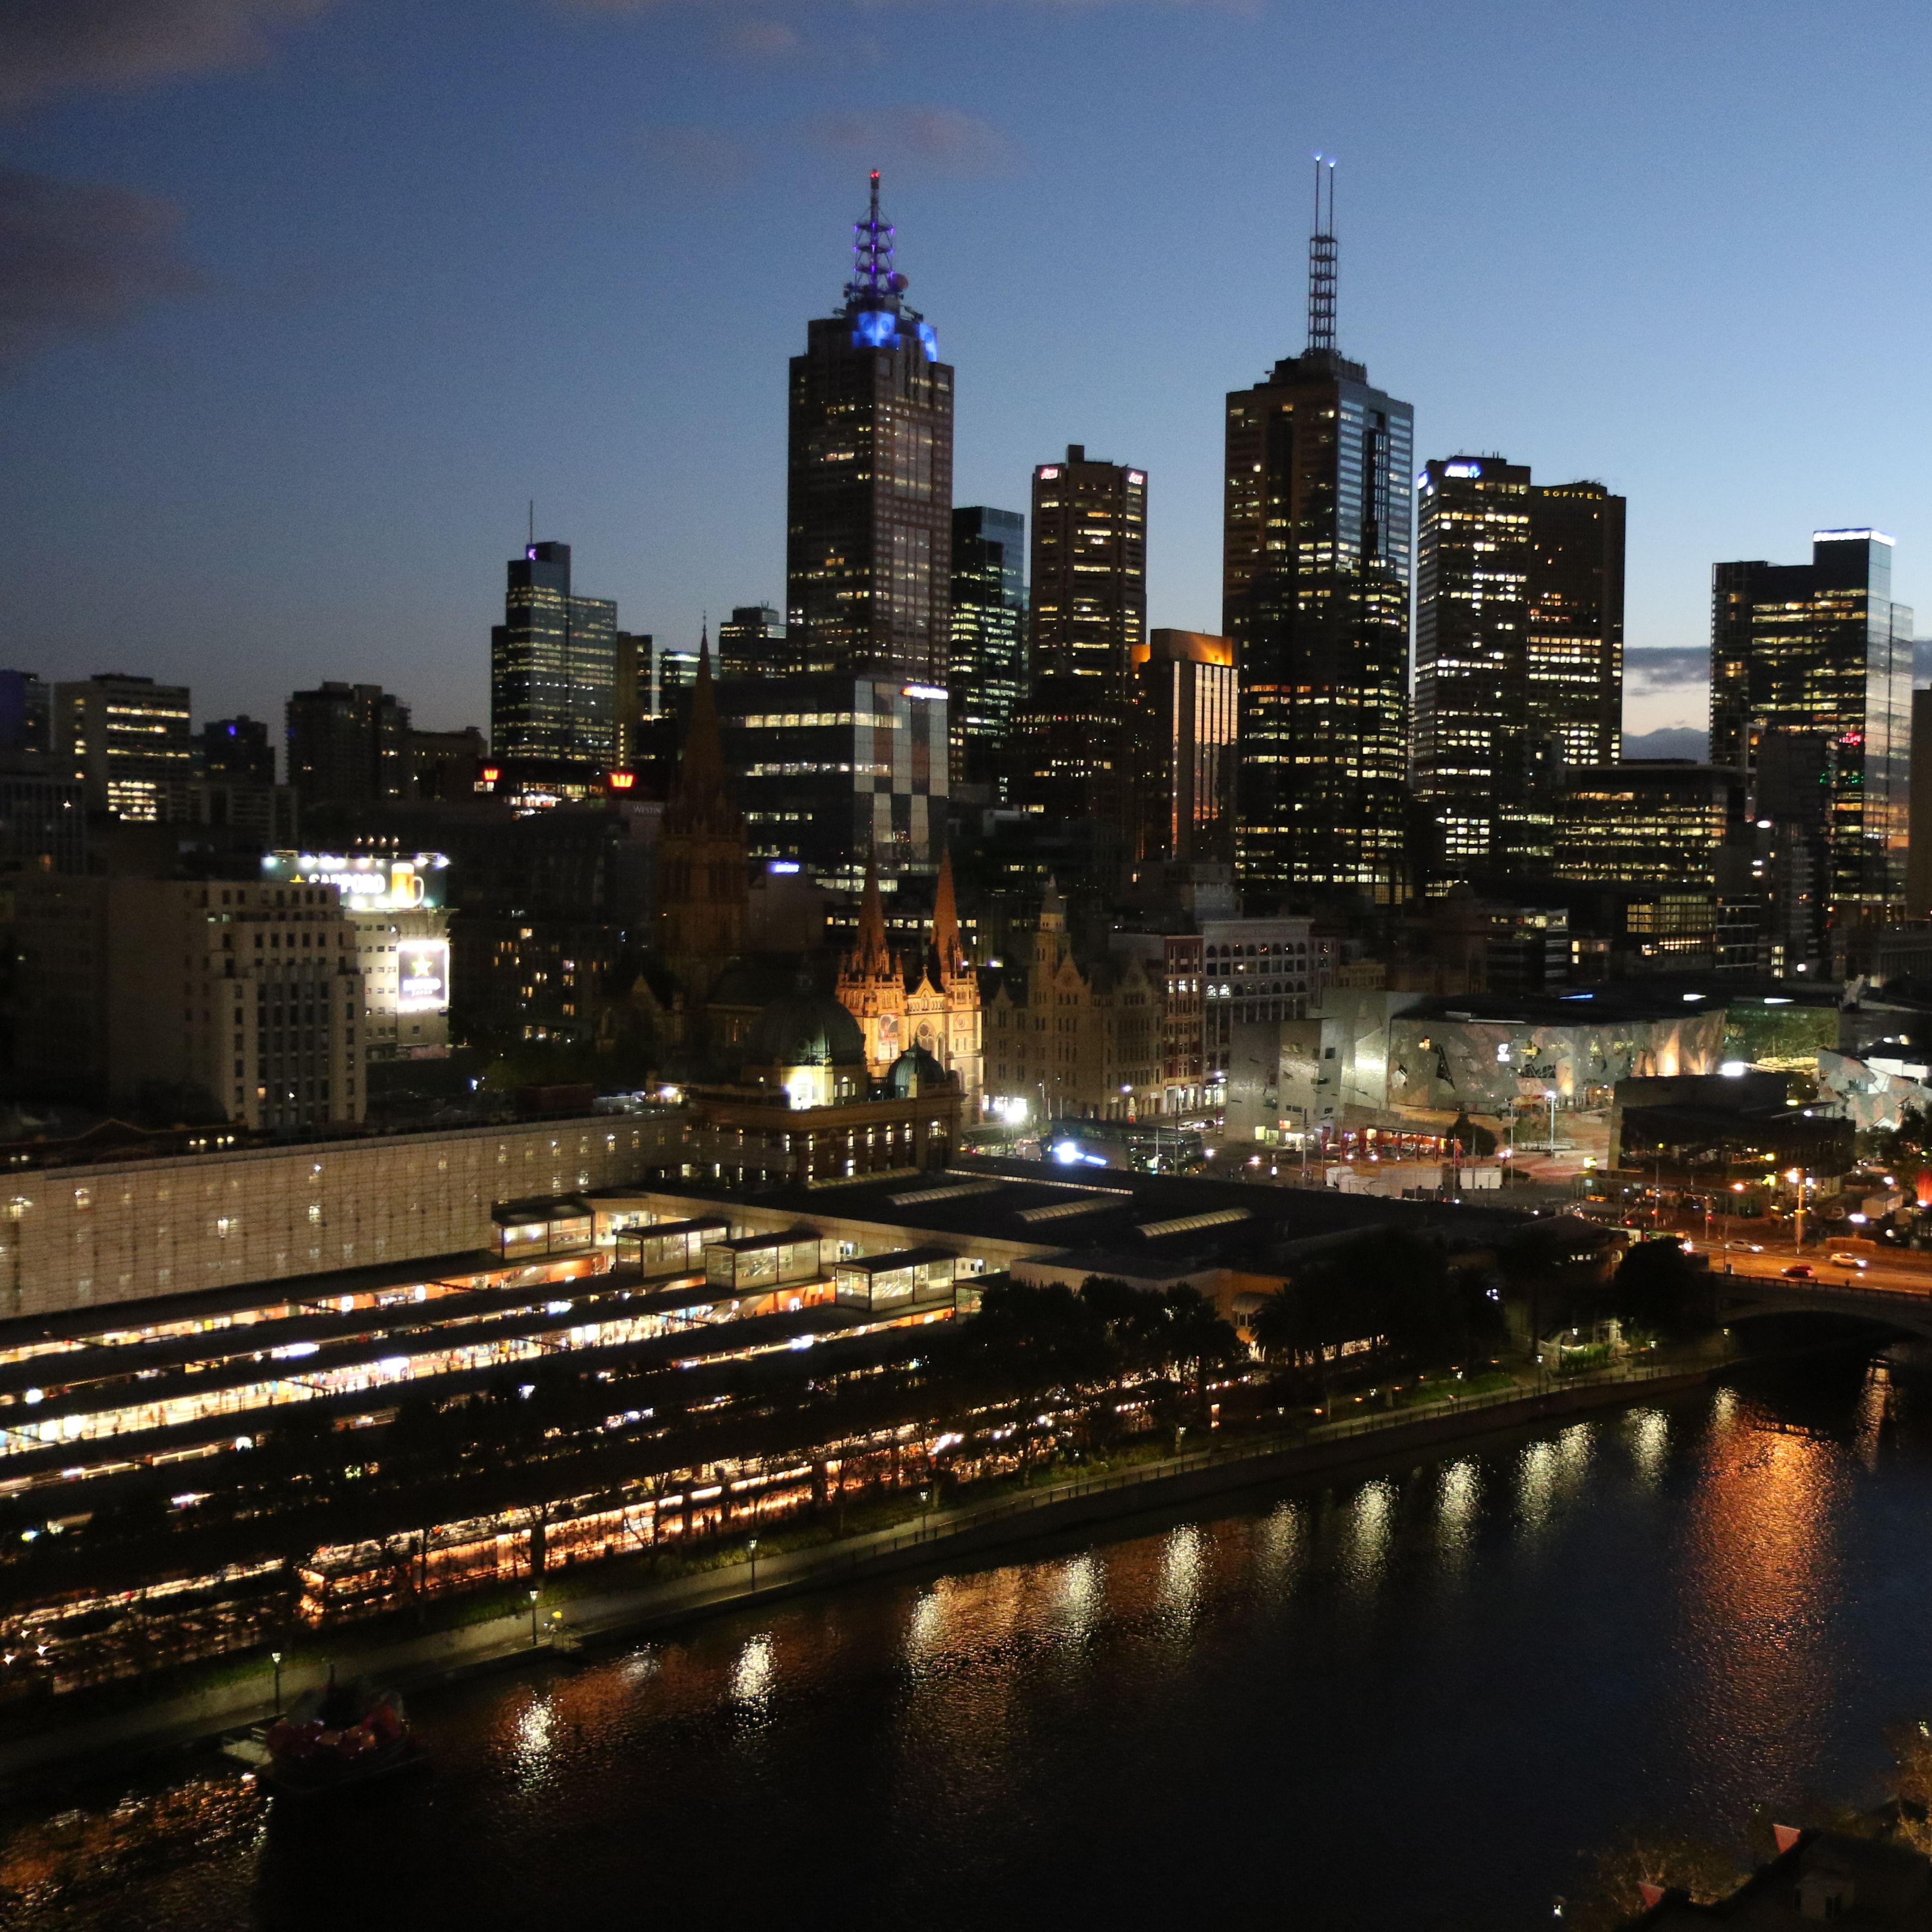 Melbourne 037 vqfawd